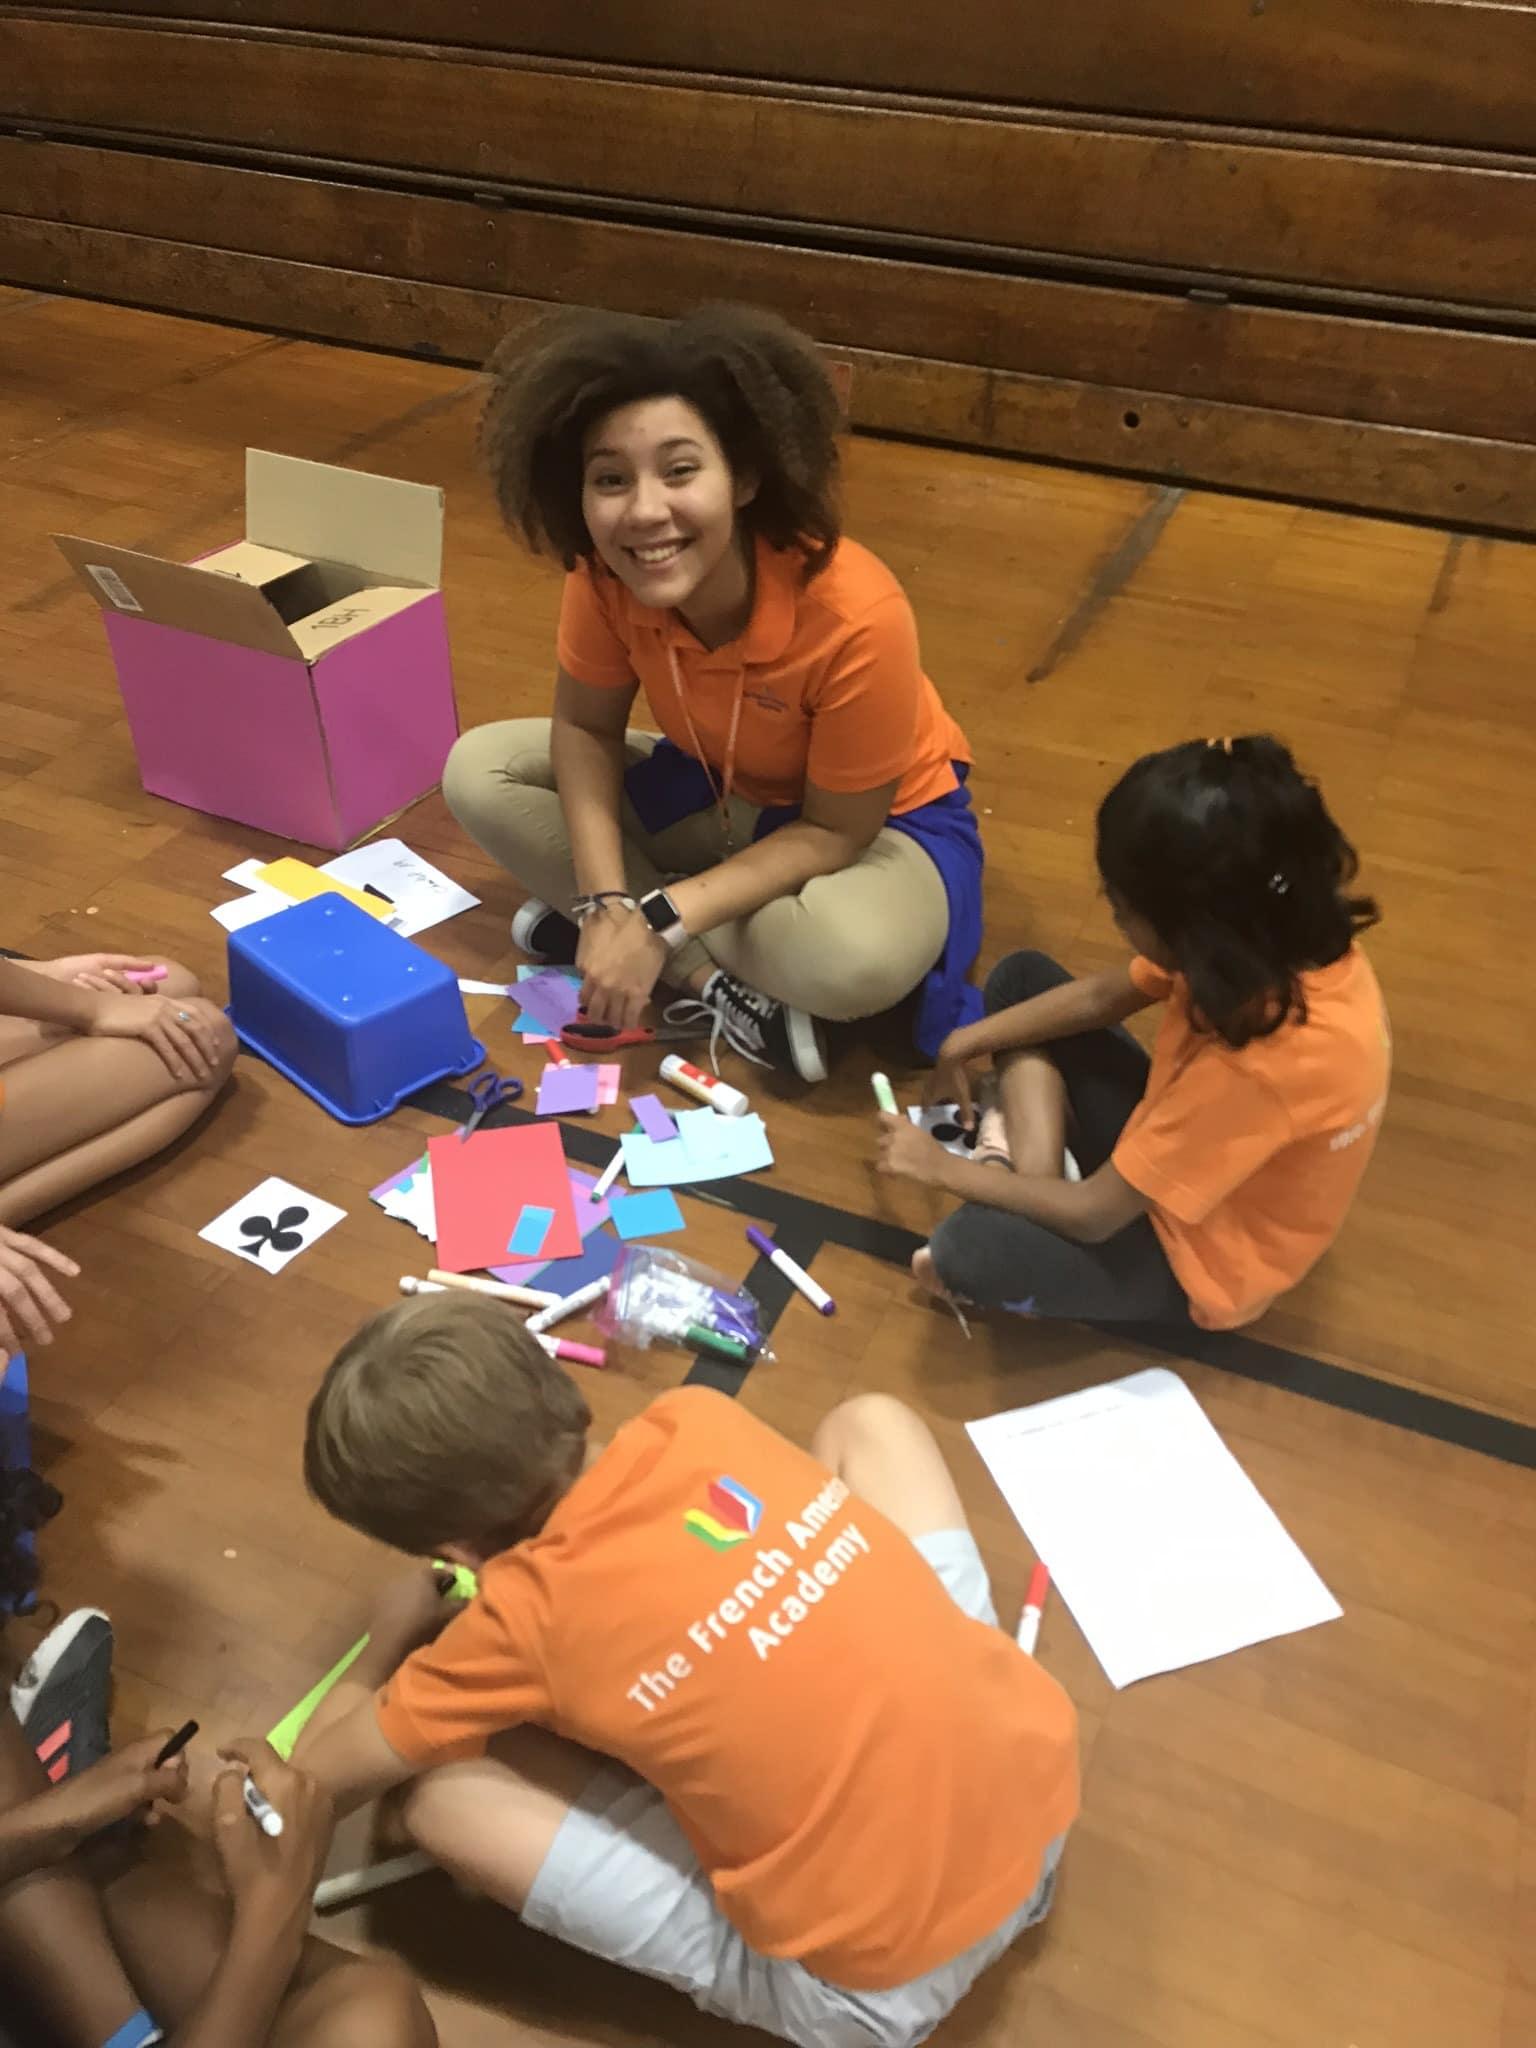 Spirit Day - Student Life - Blog - Jersey City Campus